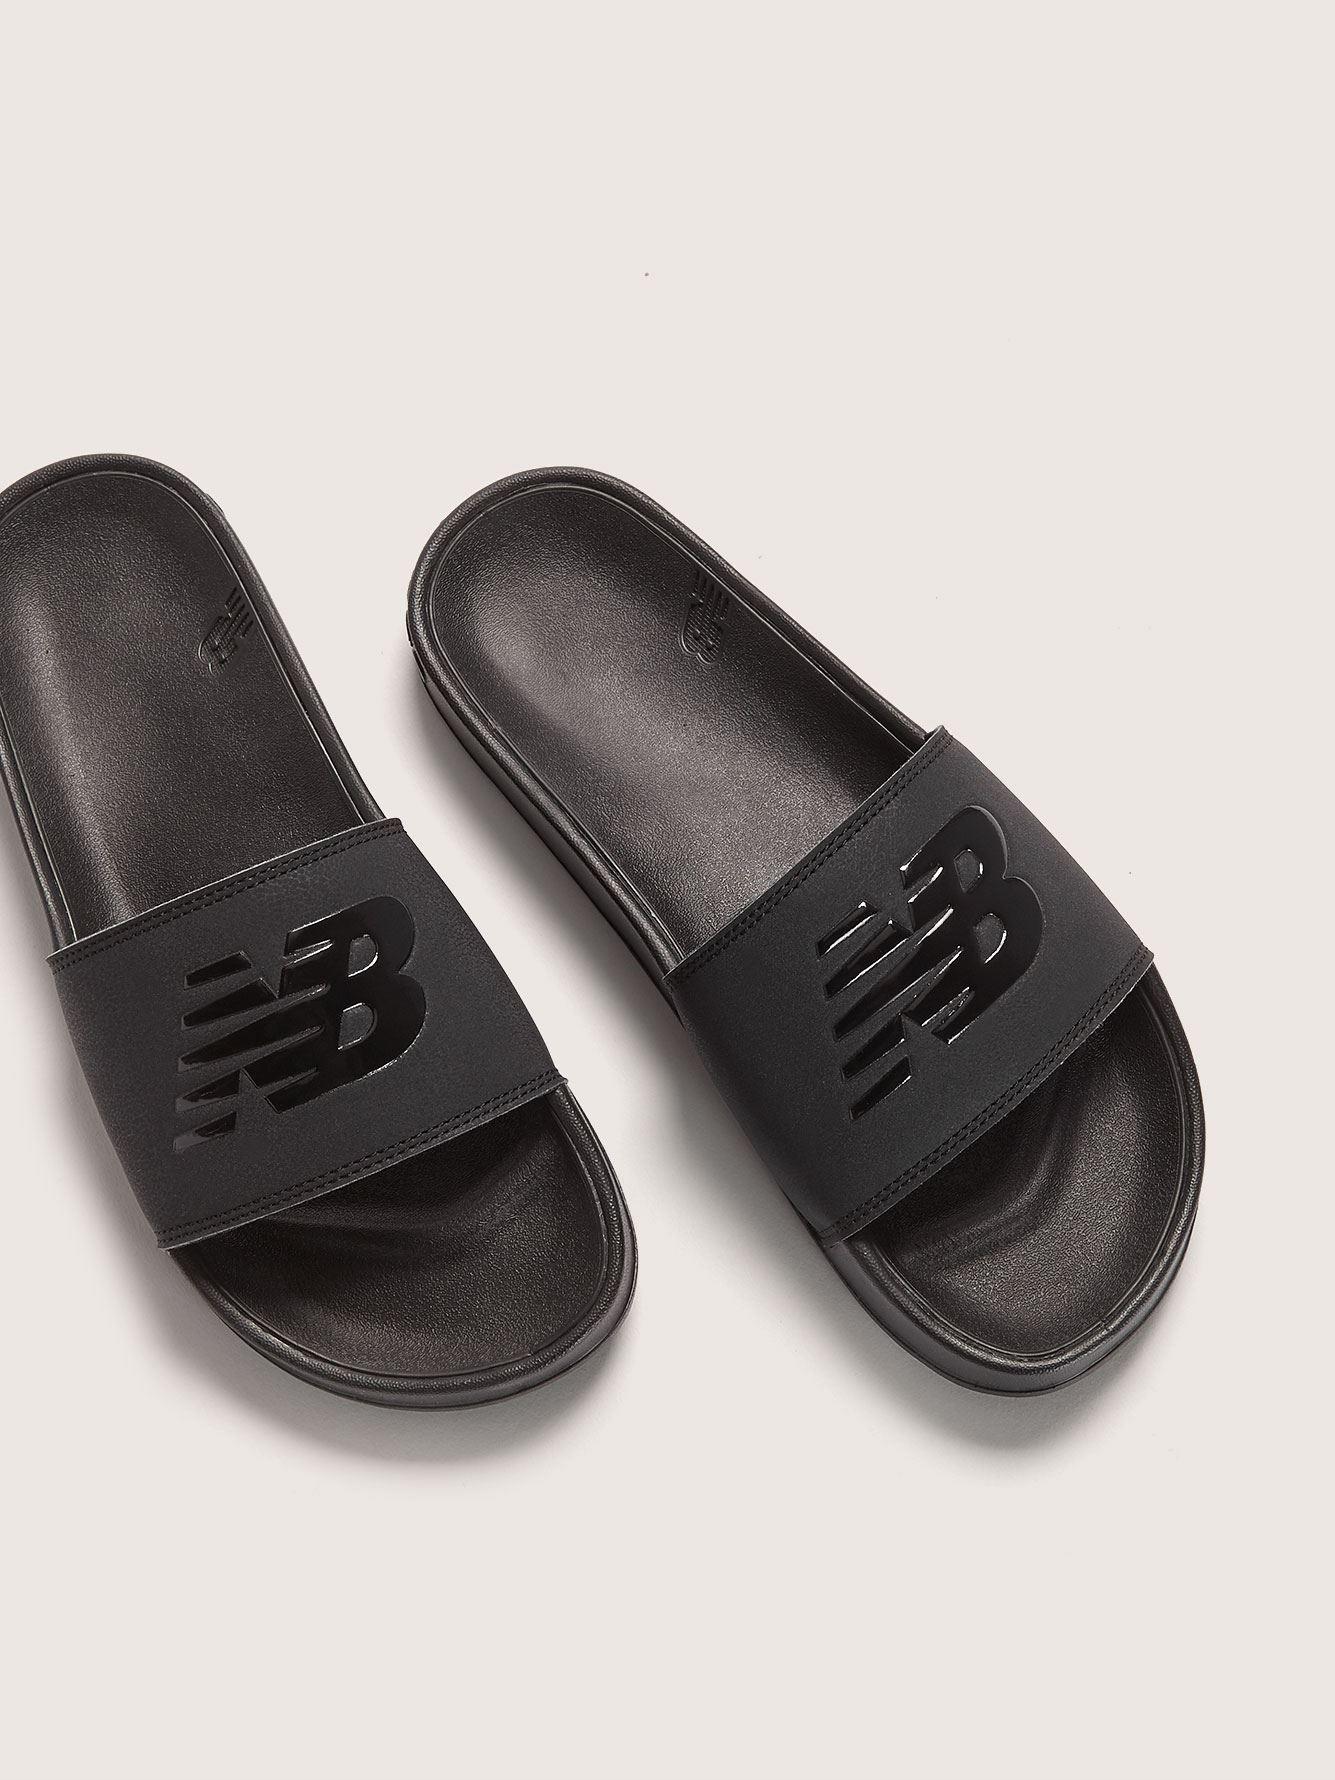 new balance slippers